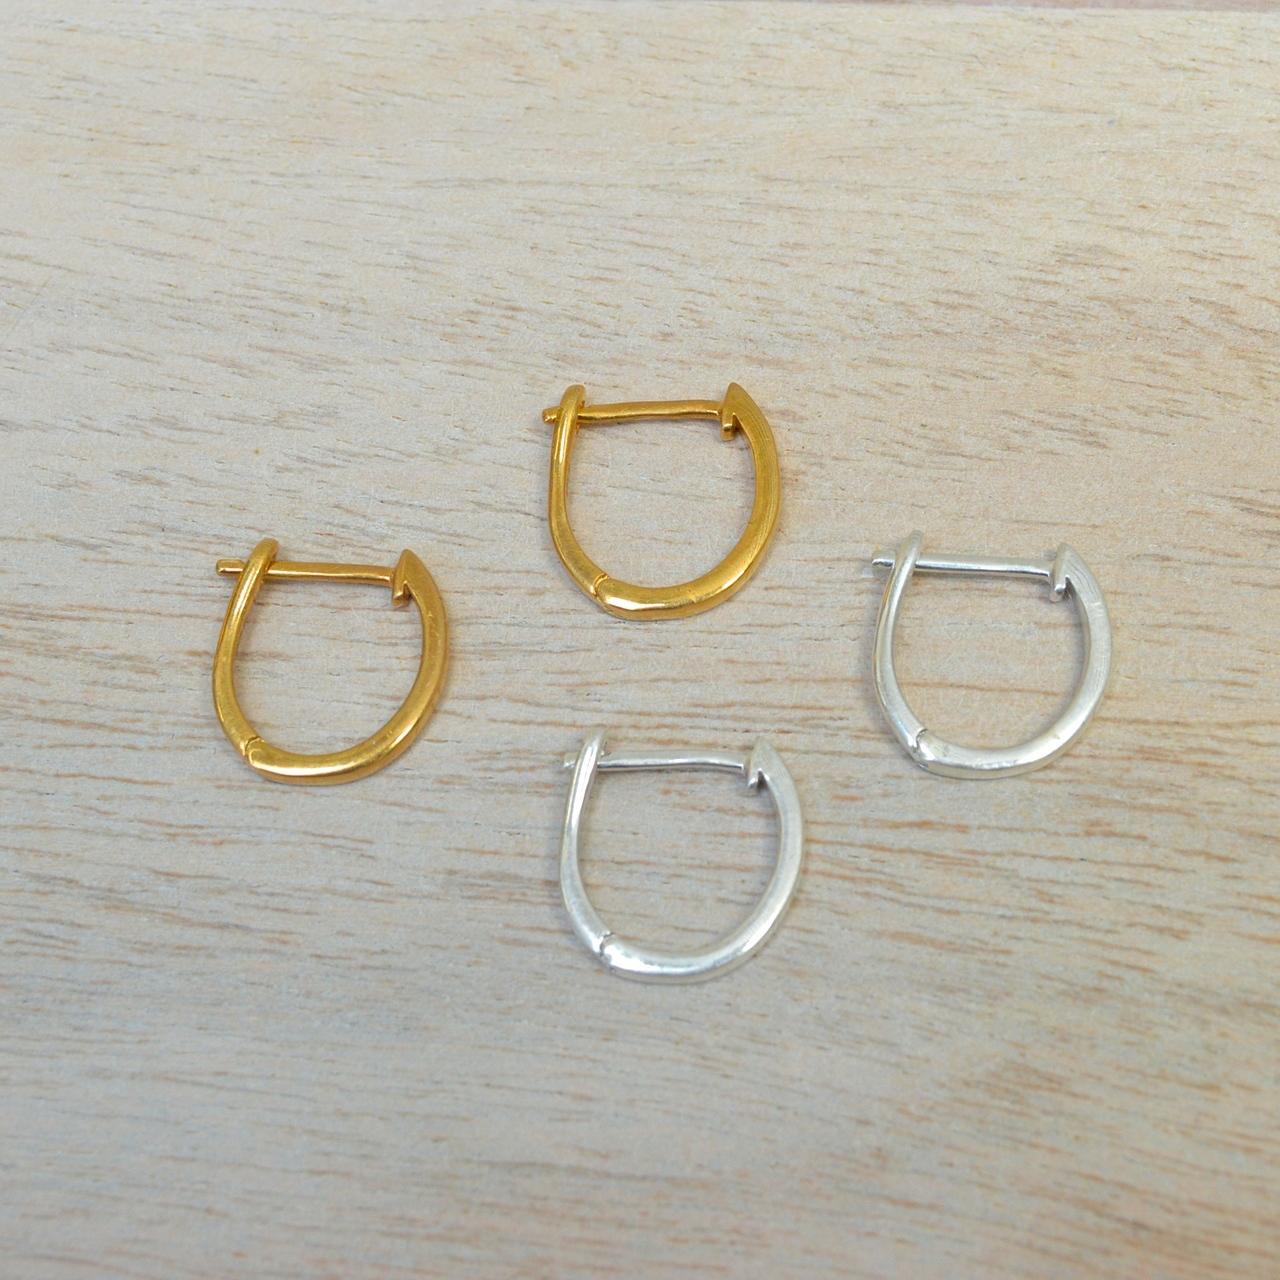 Huggie Earrings in Gold